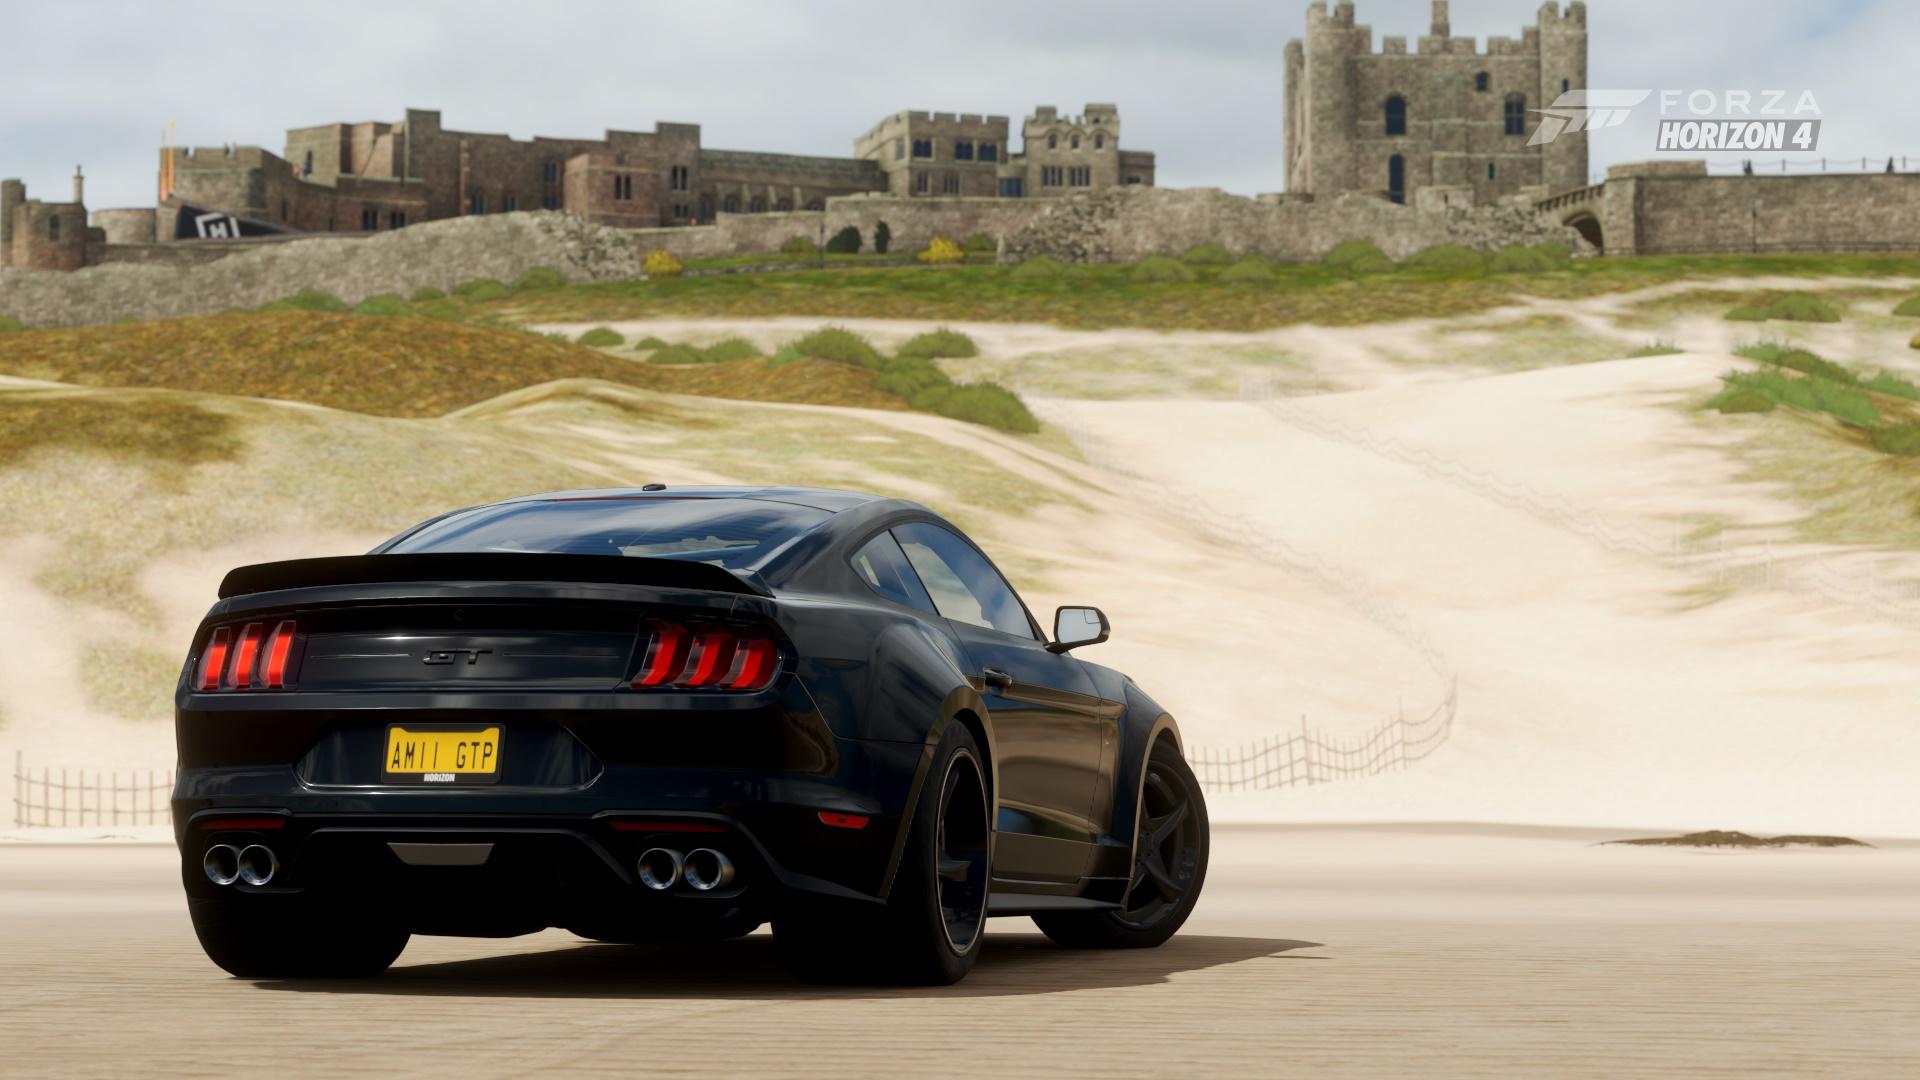 Custom G Wagon >> A Custom Mustang and Lamborghini Spyder Race into Forza Horizon 4 Today